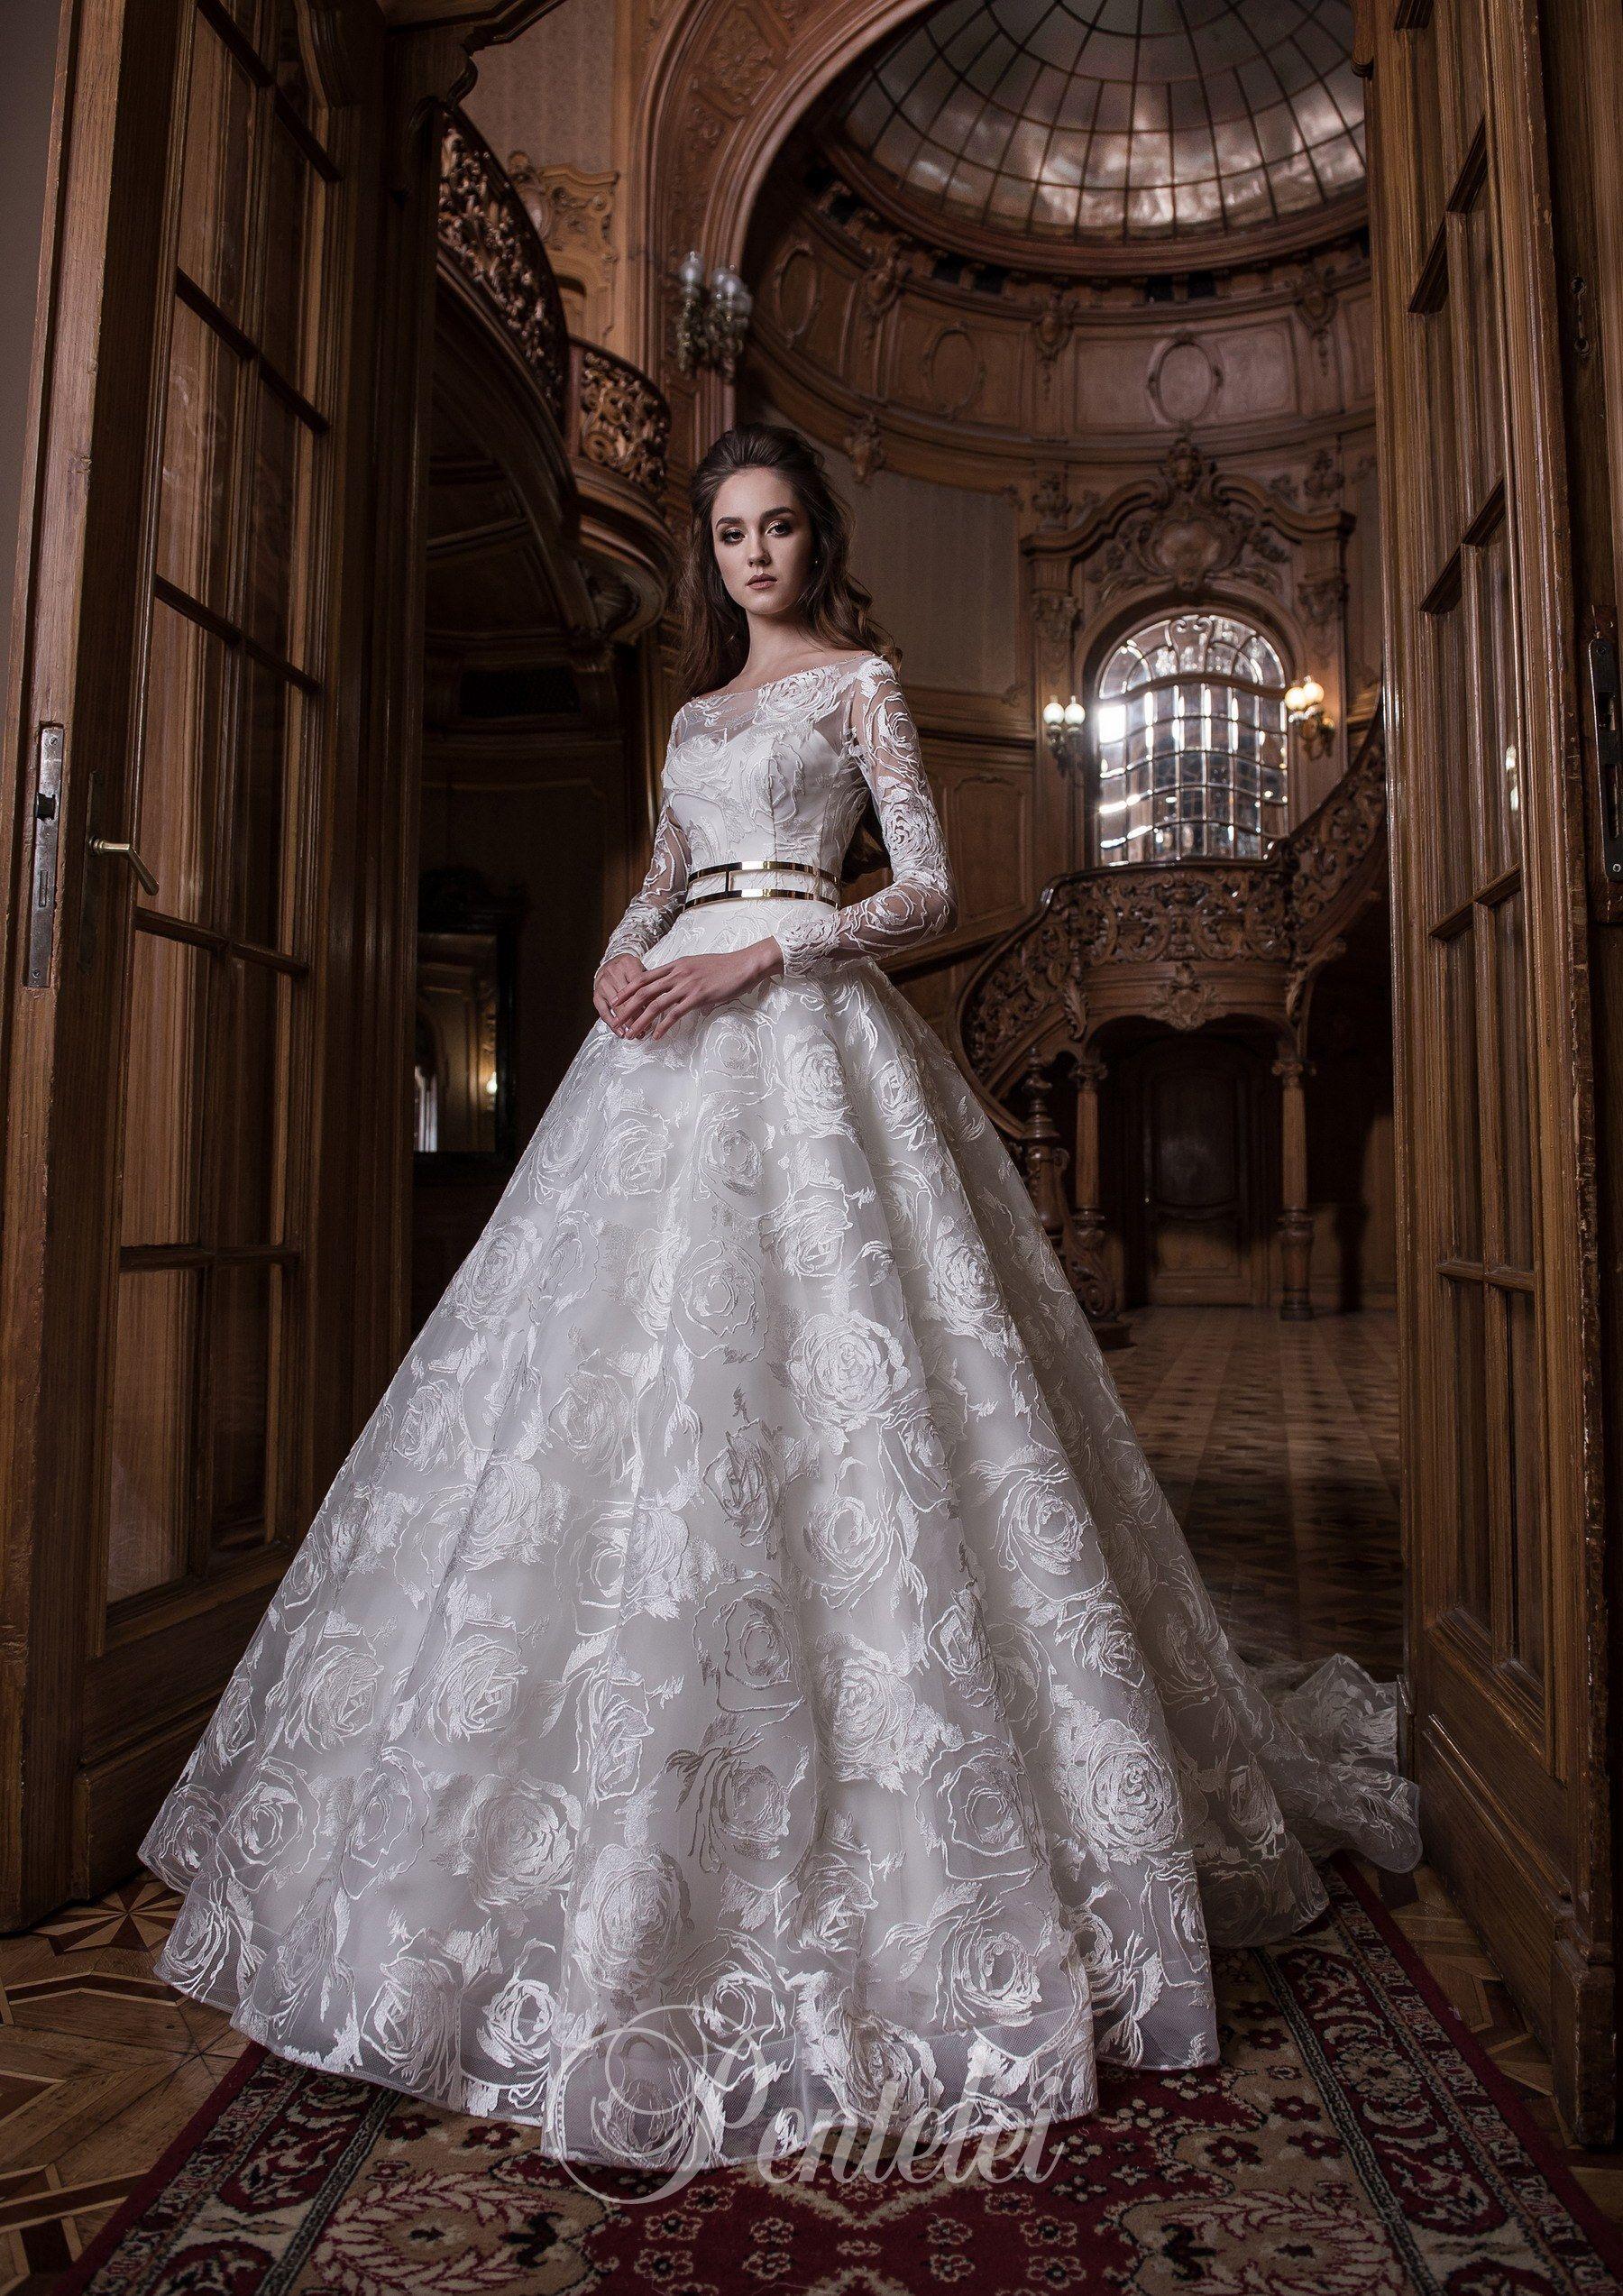 Antique cream wedding dress    Buy wholesale wedding dresses from Pentelei  Blanche fashion